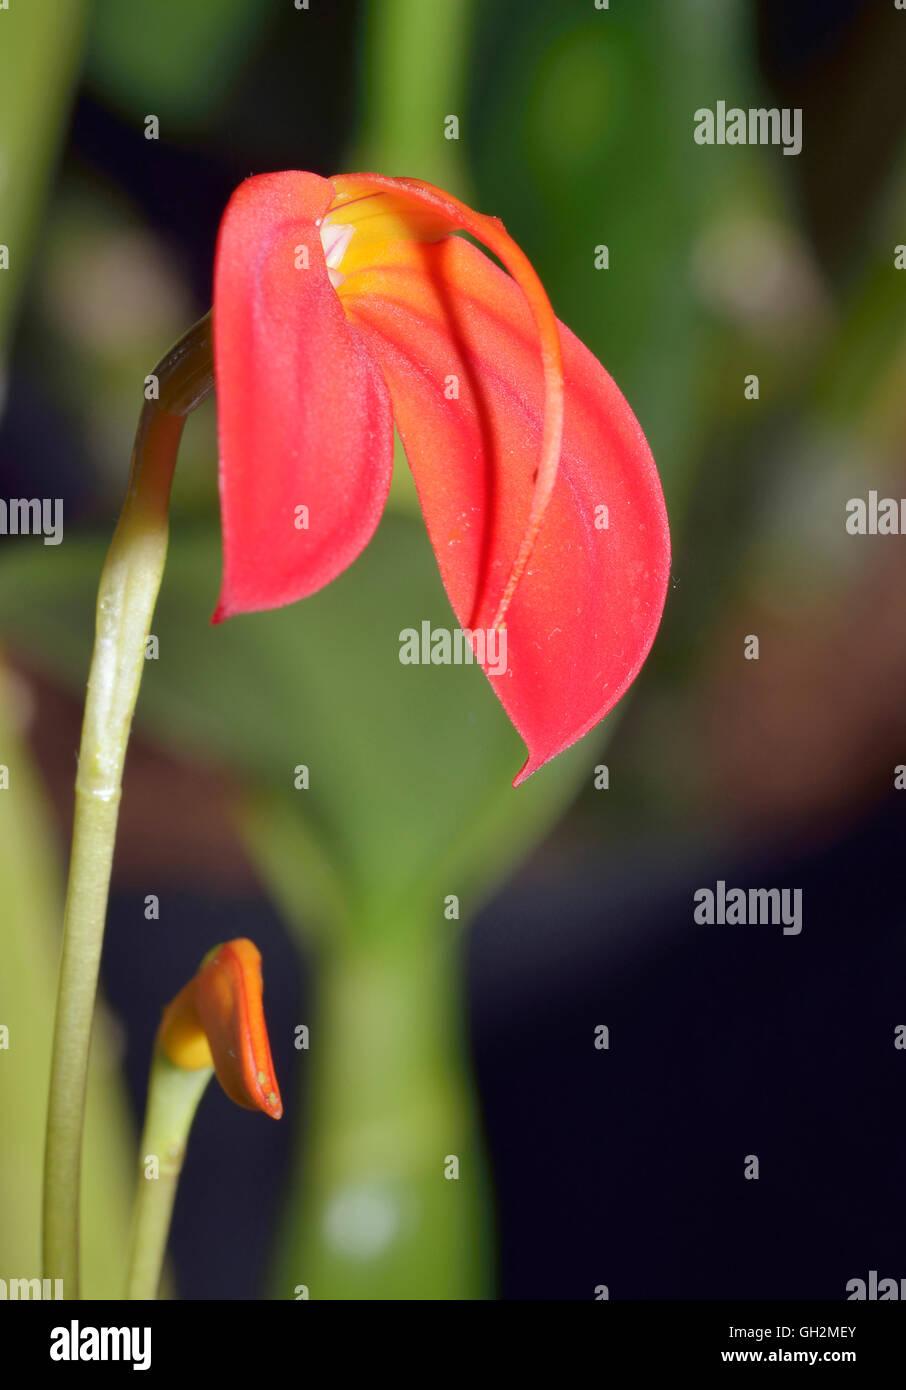 Fire-Red Masdevallia Orchid - Masdevallia ignea From Colombia Stock Photo